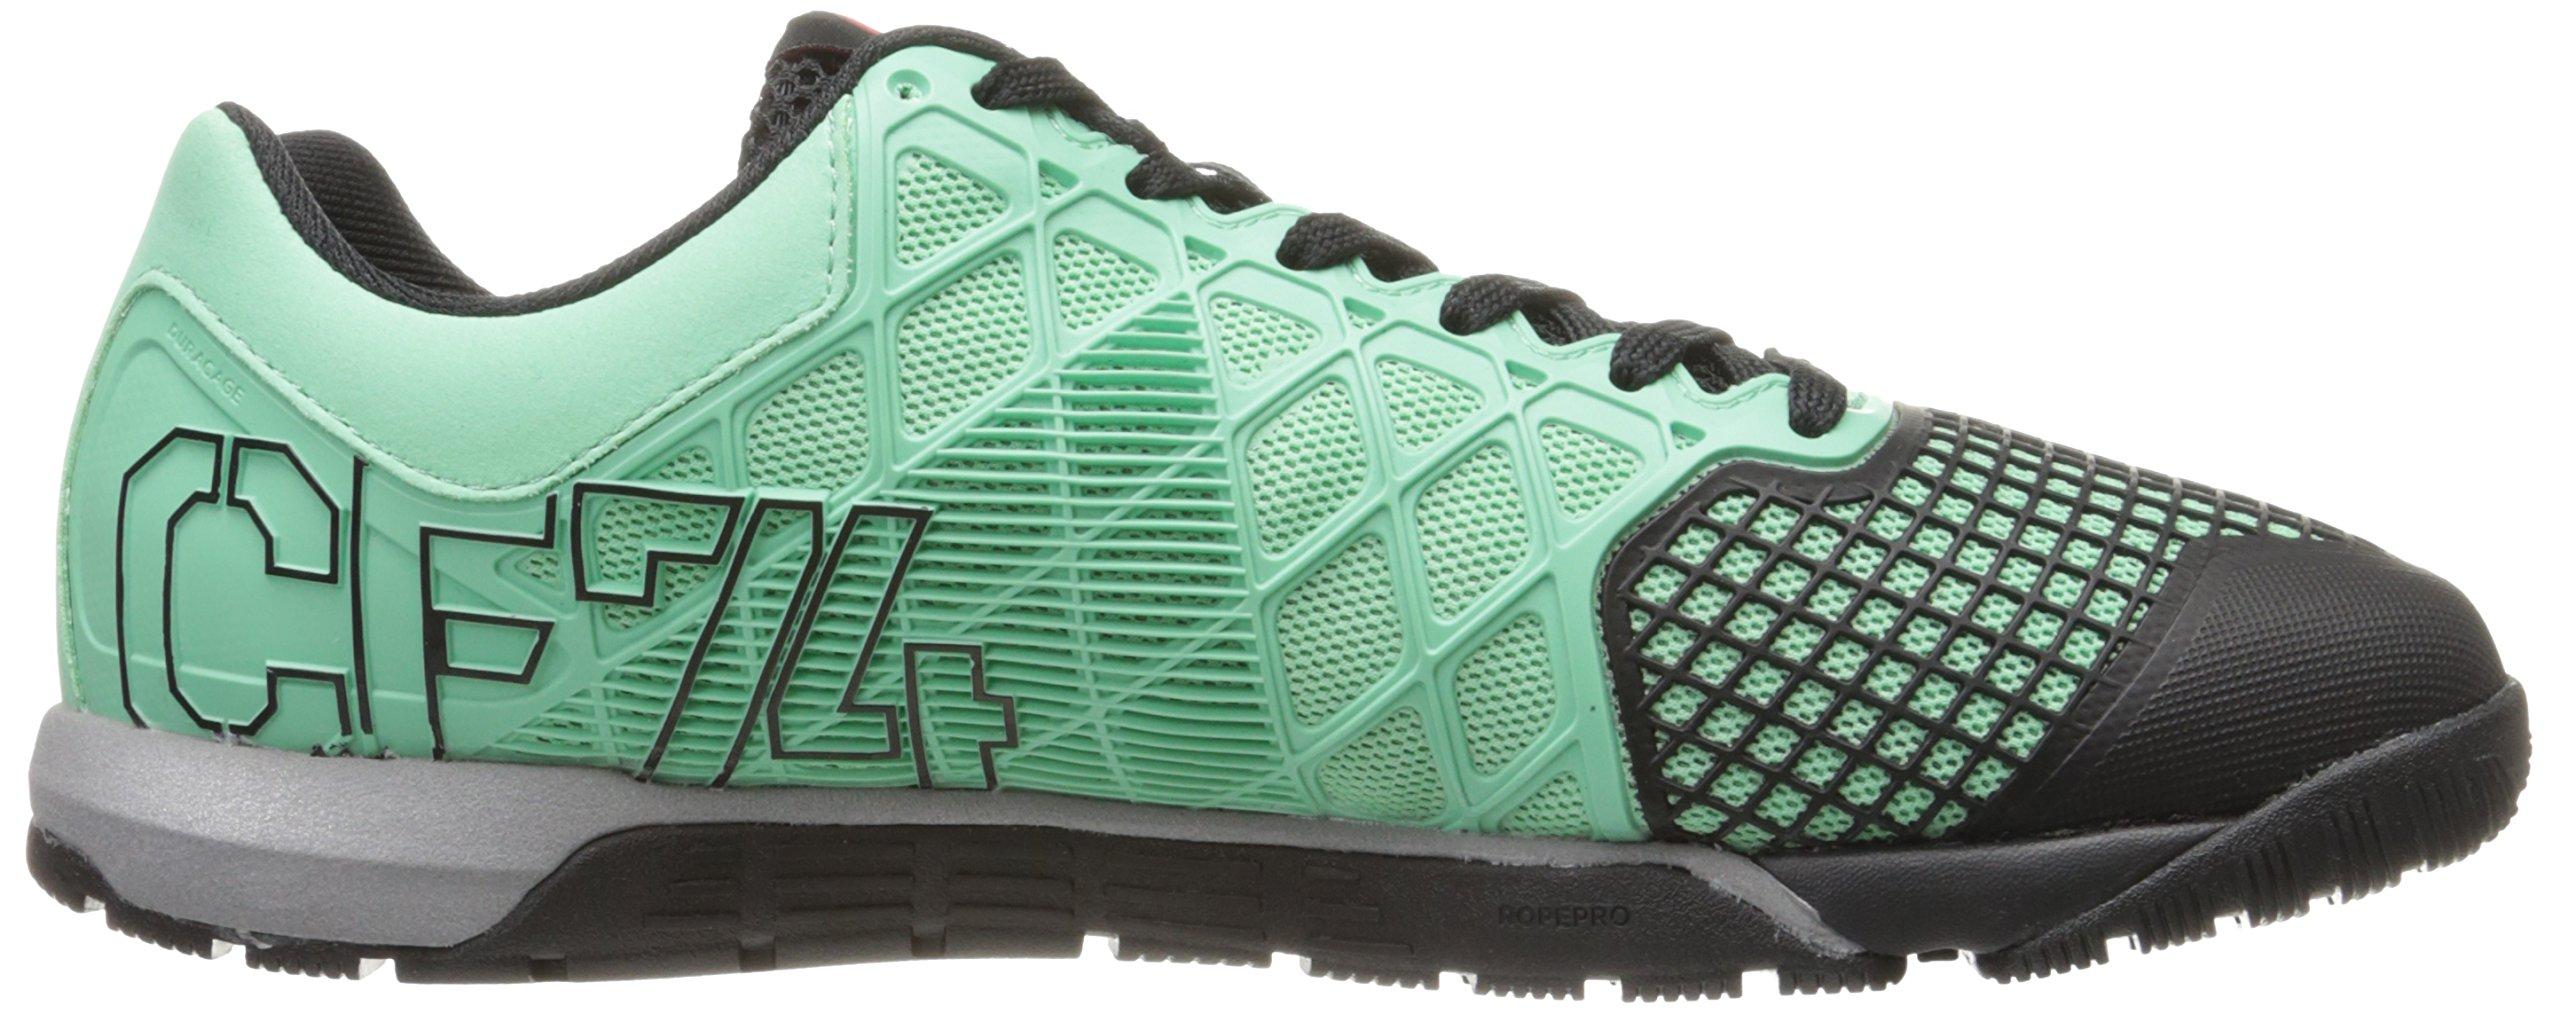 Reebok Men's Crossfit Nano 4.0 Training Shoe, Mint Glow/Black/Metallic Silver, 8 M US